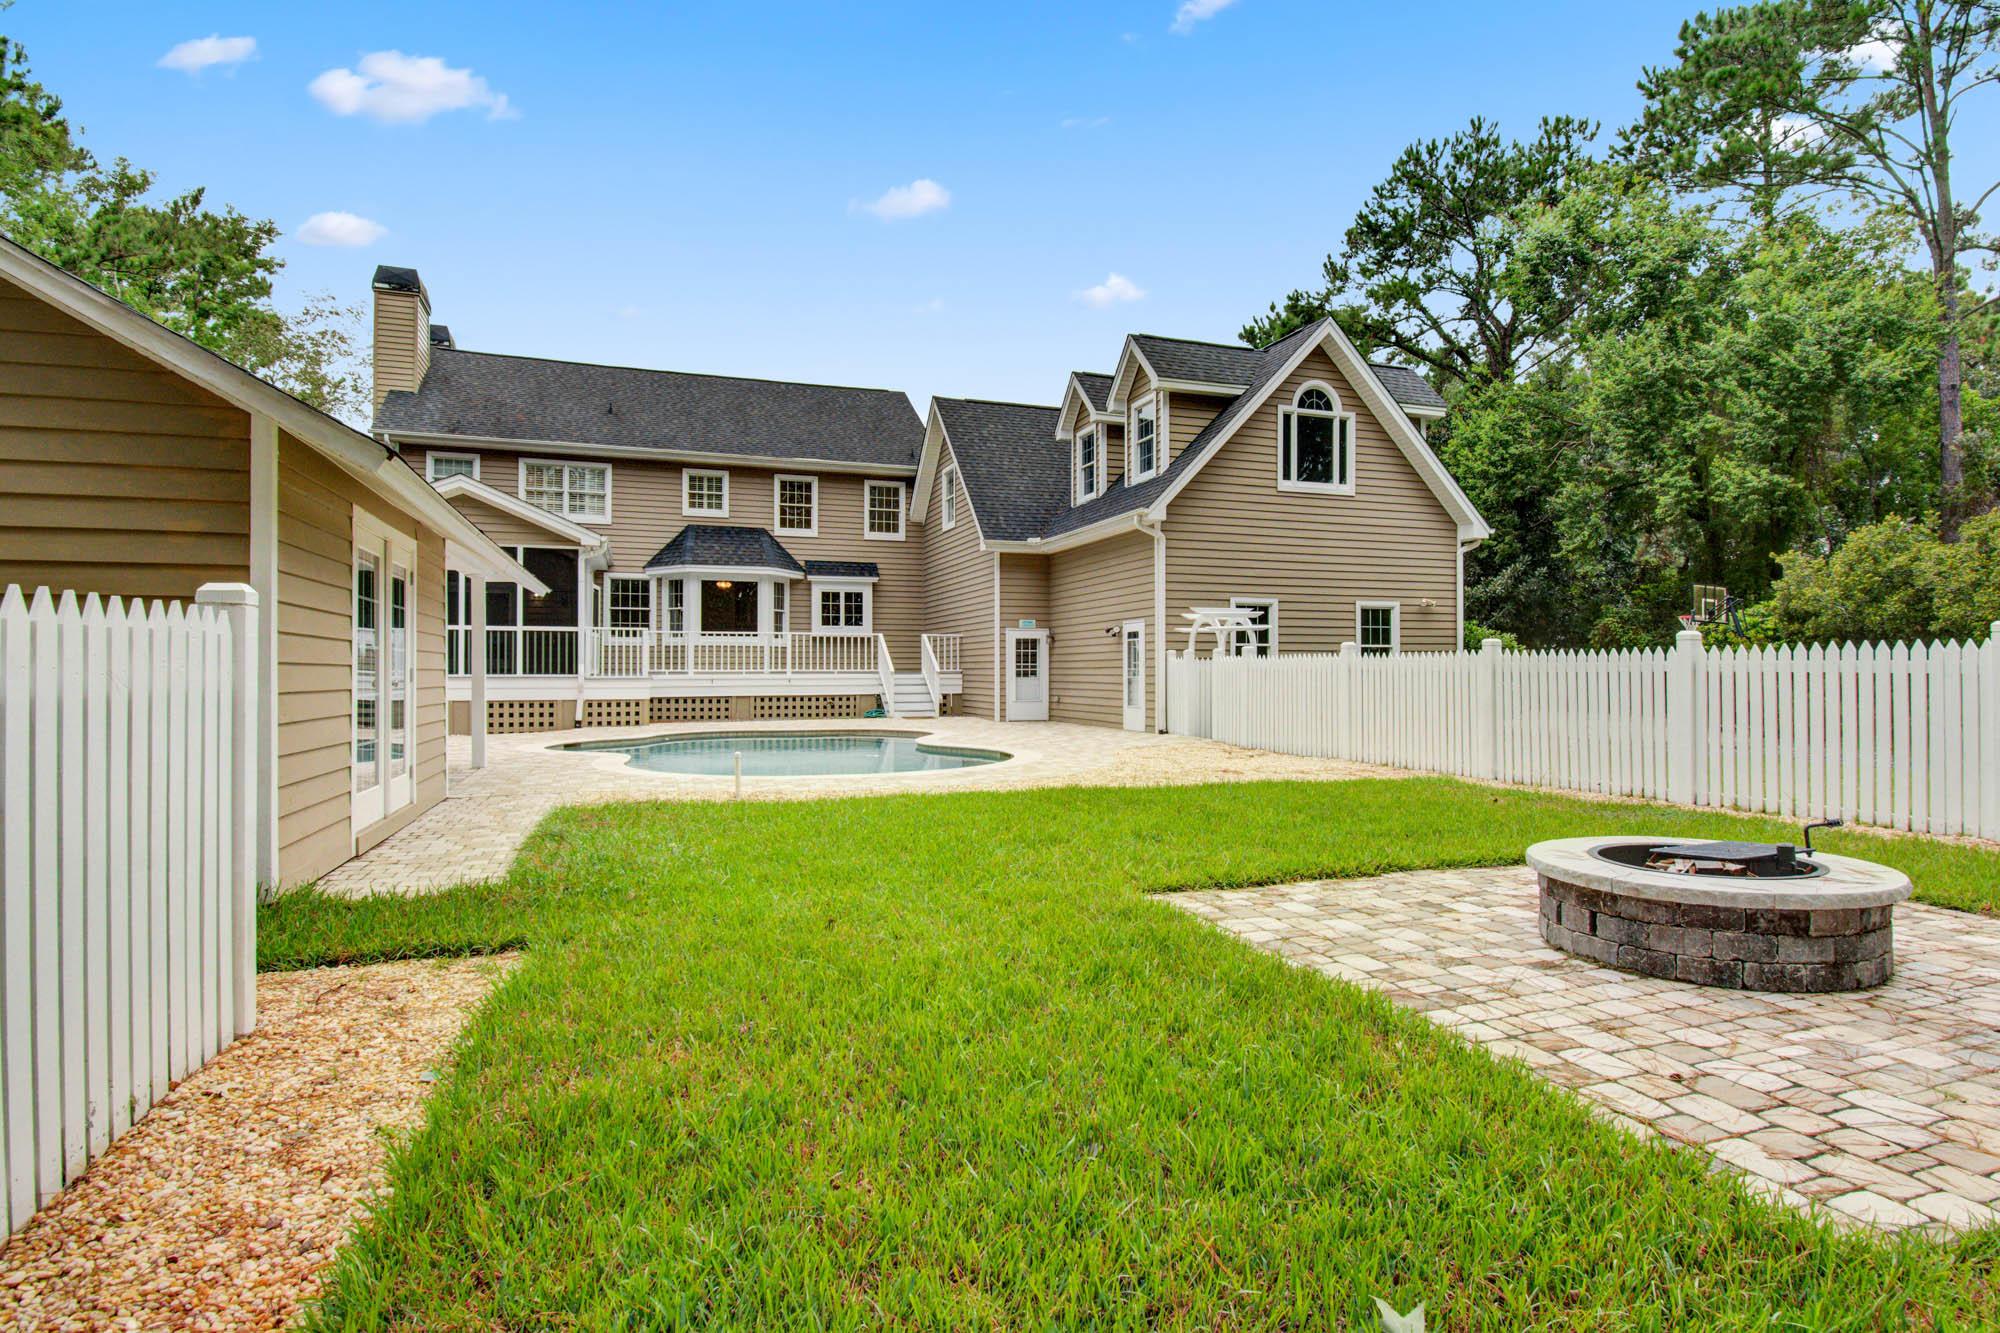 Dunes West Homes For Sale - 3515 Colonel Vanderhorst, Mount Pleasant, SC - 24